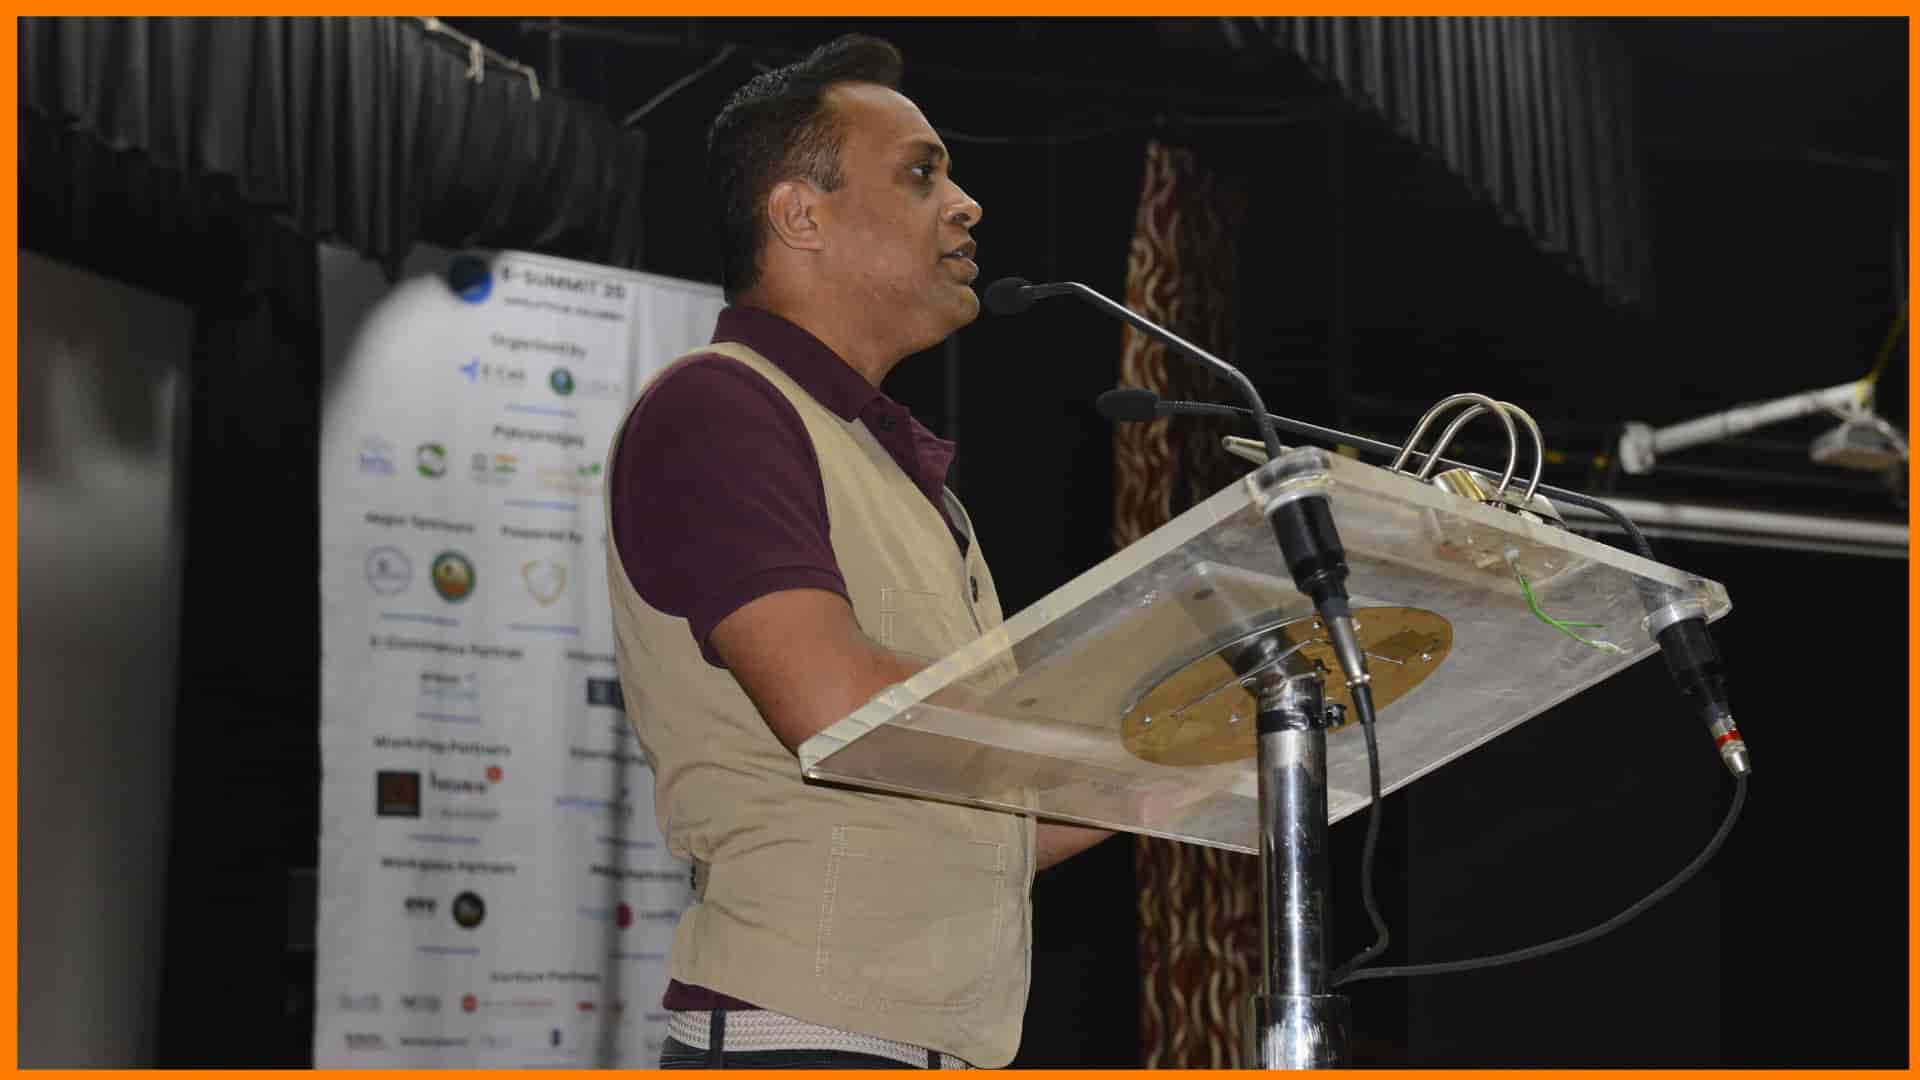 E-Summit'20 IIT Roorkee Concluded on 2 Feb